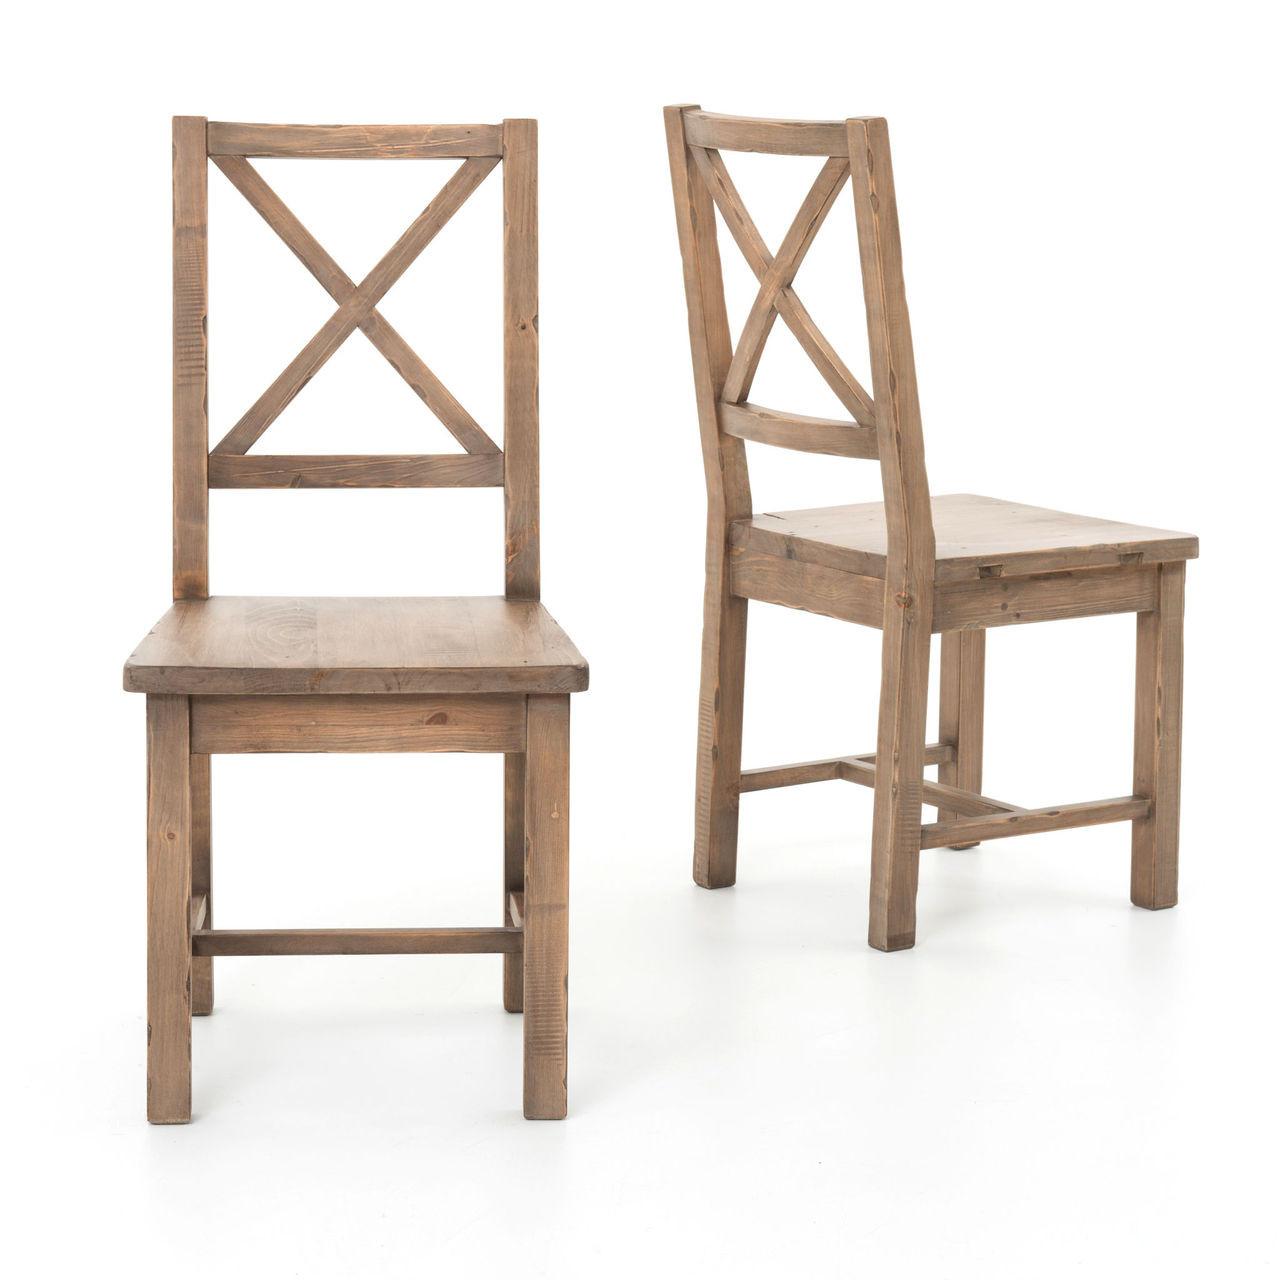 wood dining room chair | Coastal Rustic Solid Wood Dining Room Chair | Zin Home